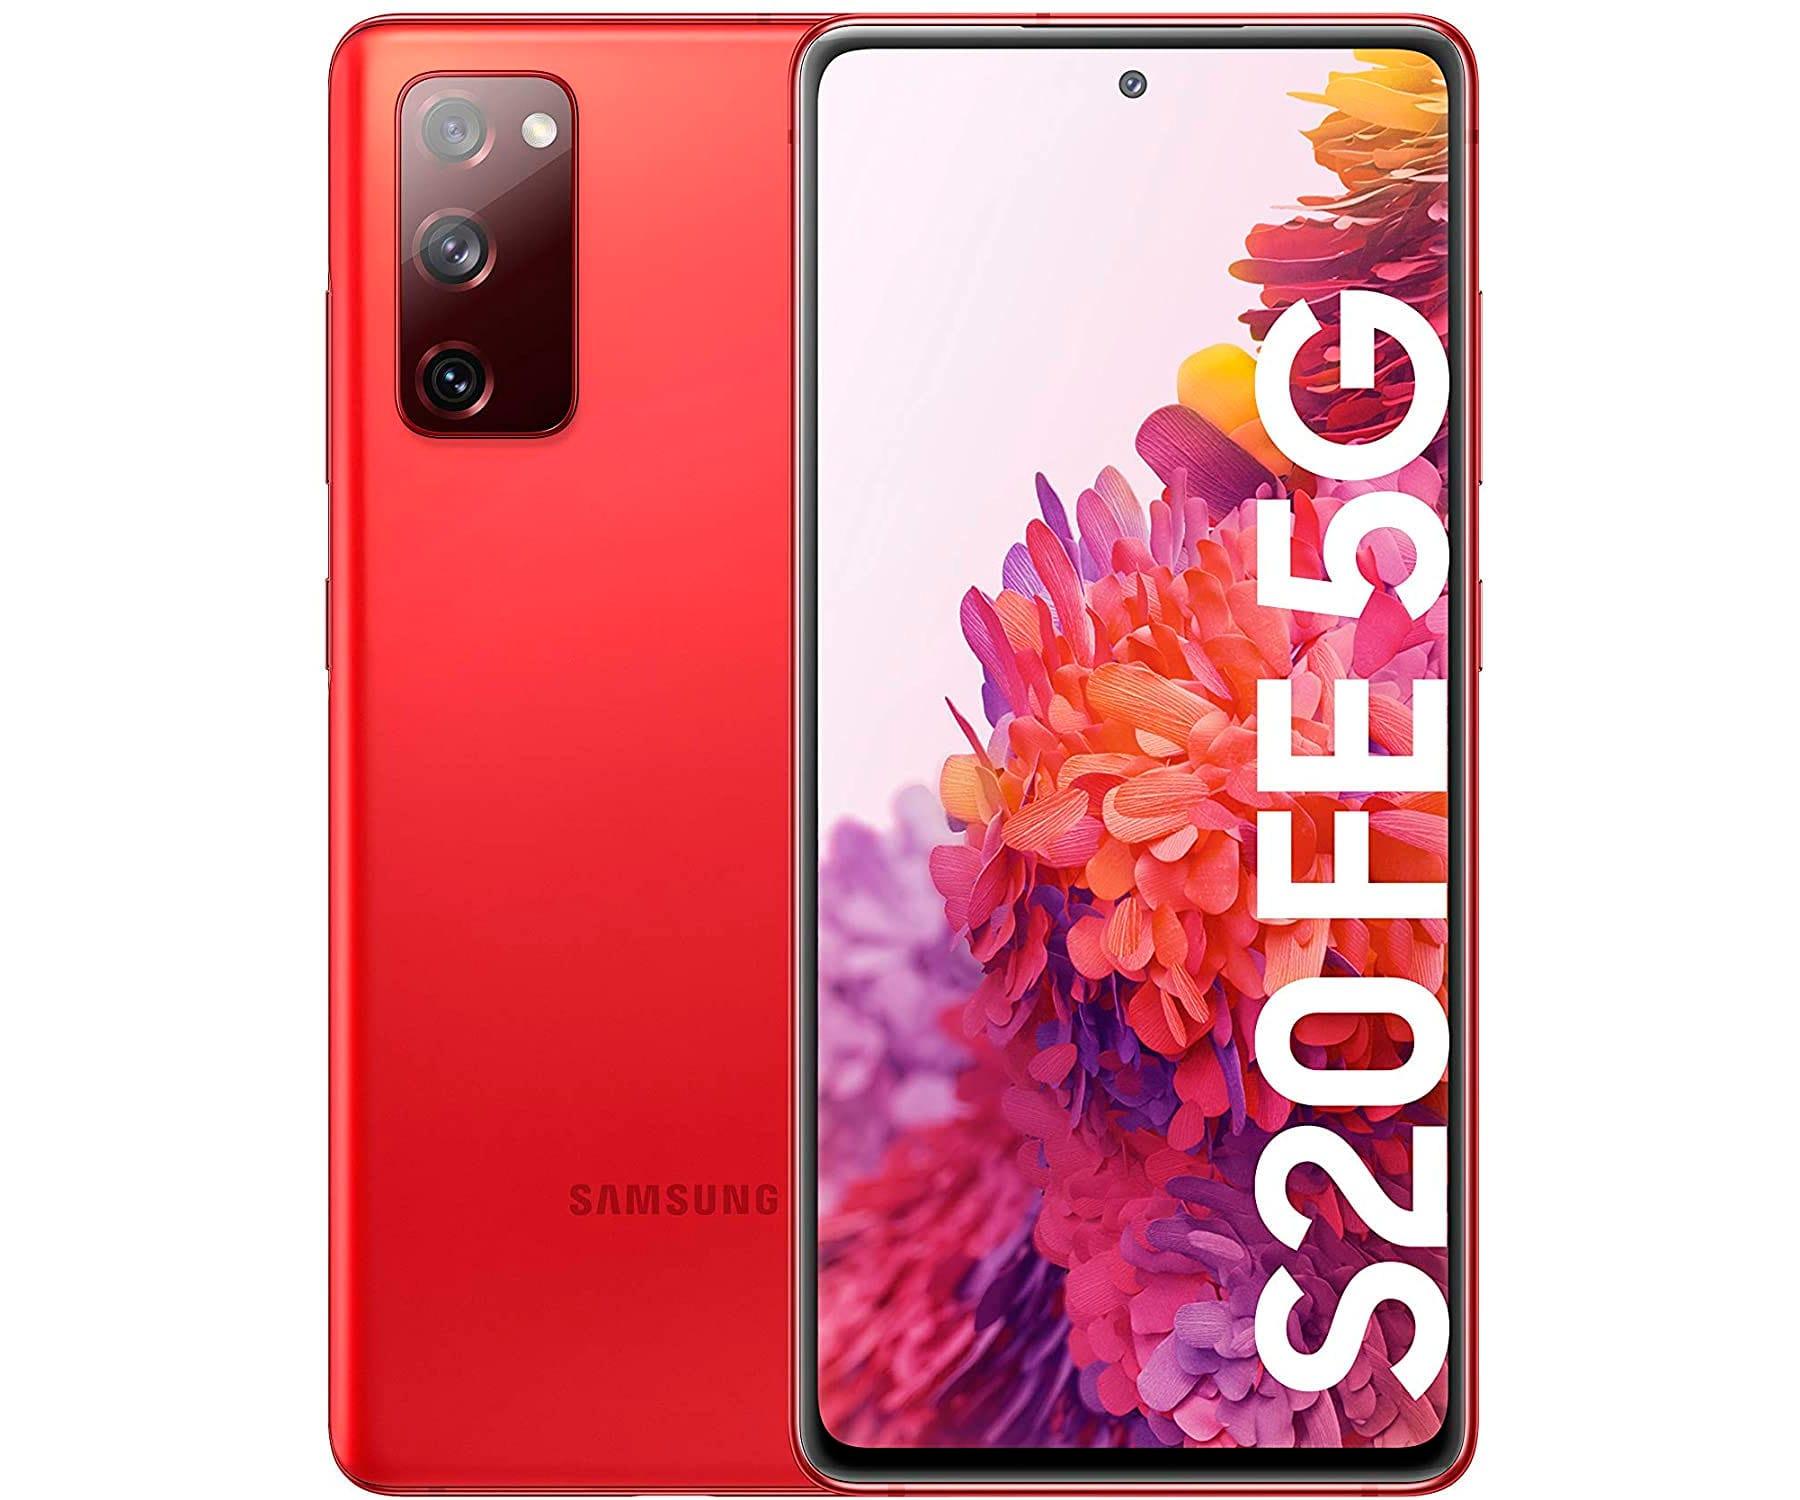 SAMSUNG G781 GALAXY S20 FE ROJO MÓVIL DUAL SIM 5G 6.5'' QHD+ OCTACORE 128GB 6GB RAM TRICAM 12MP SELFIES 32MP